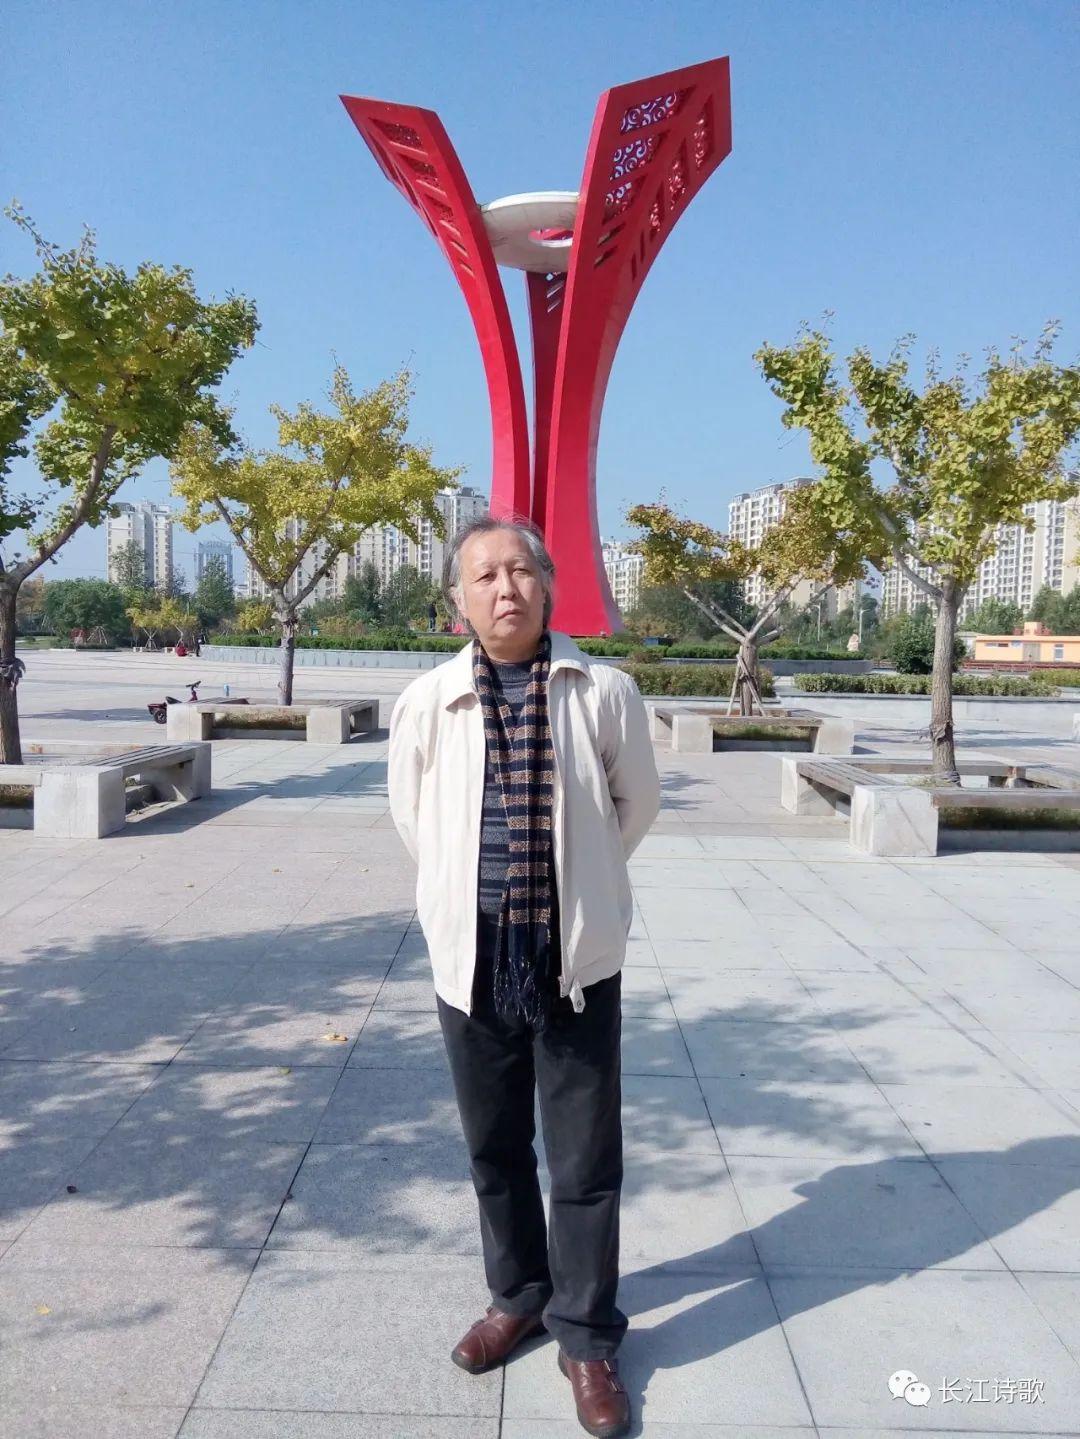 Contemporary-World-Literature-China-Yuan Hongri- SindhCourier